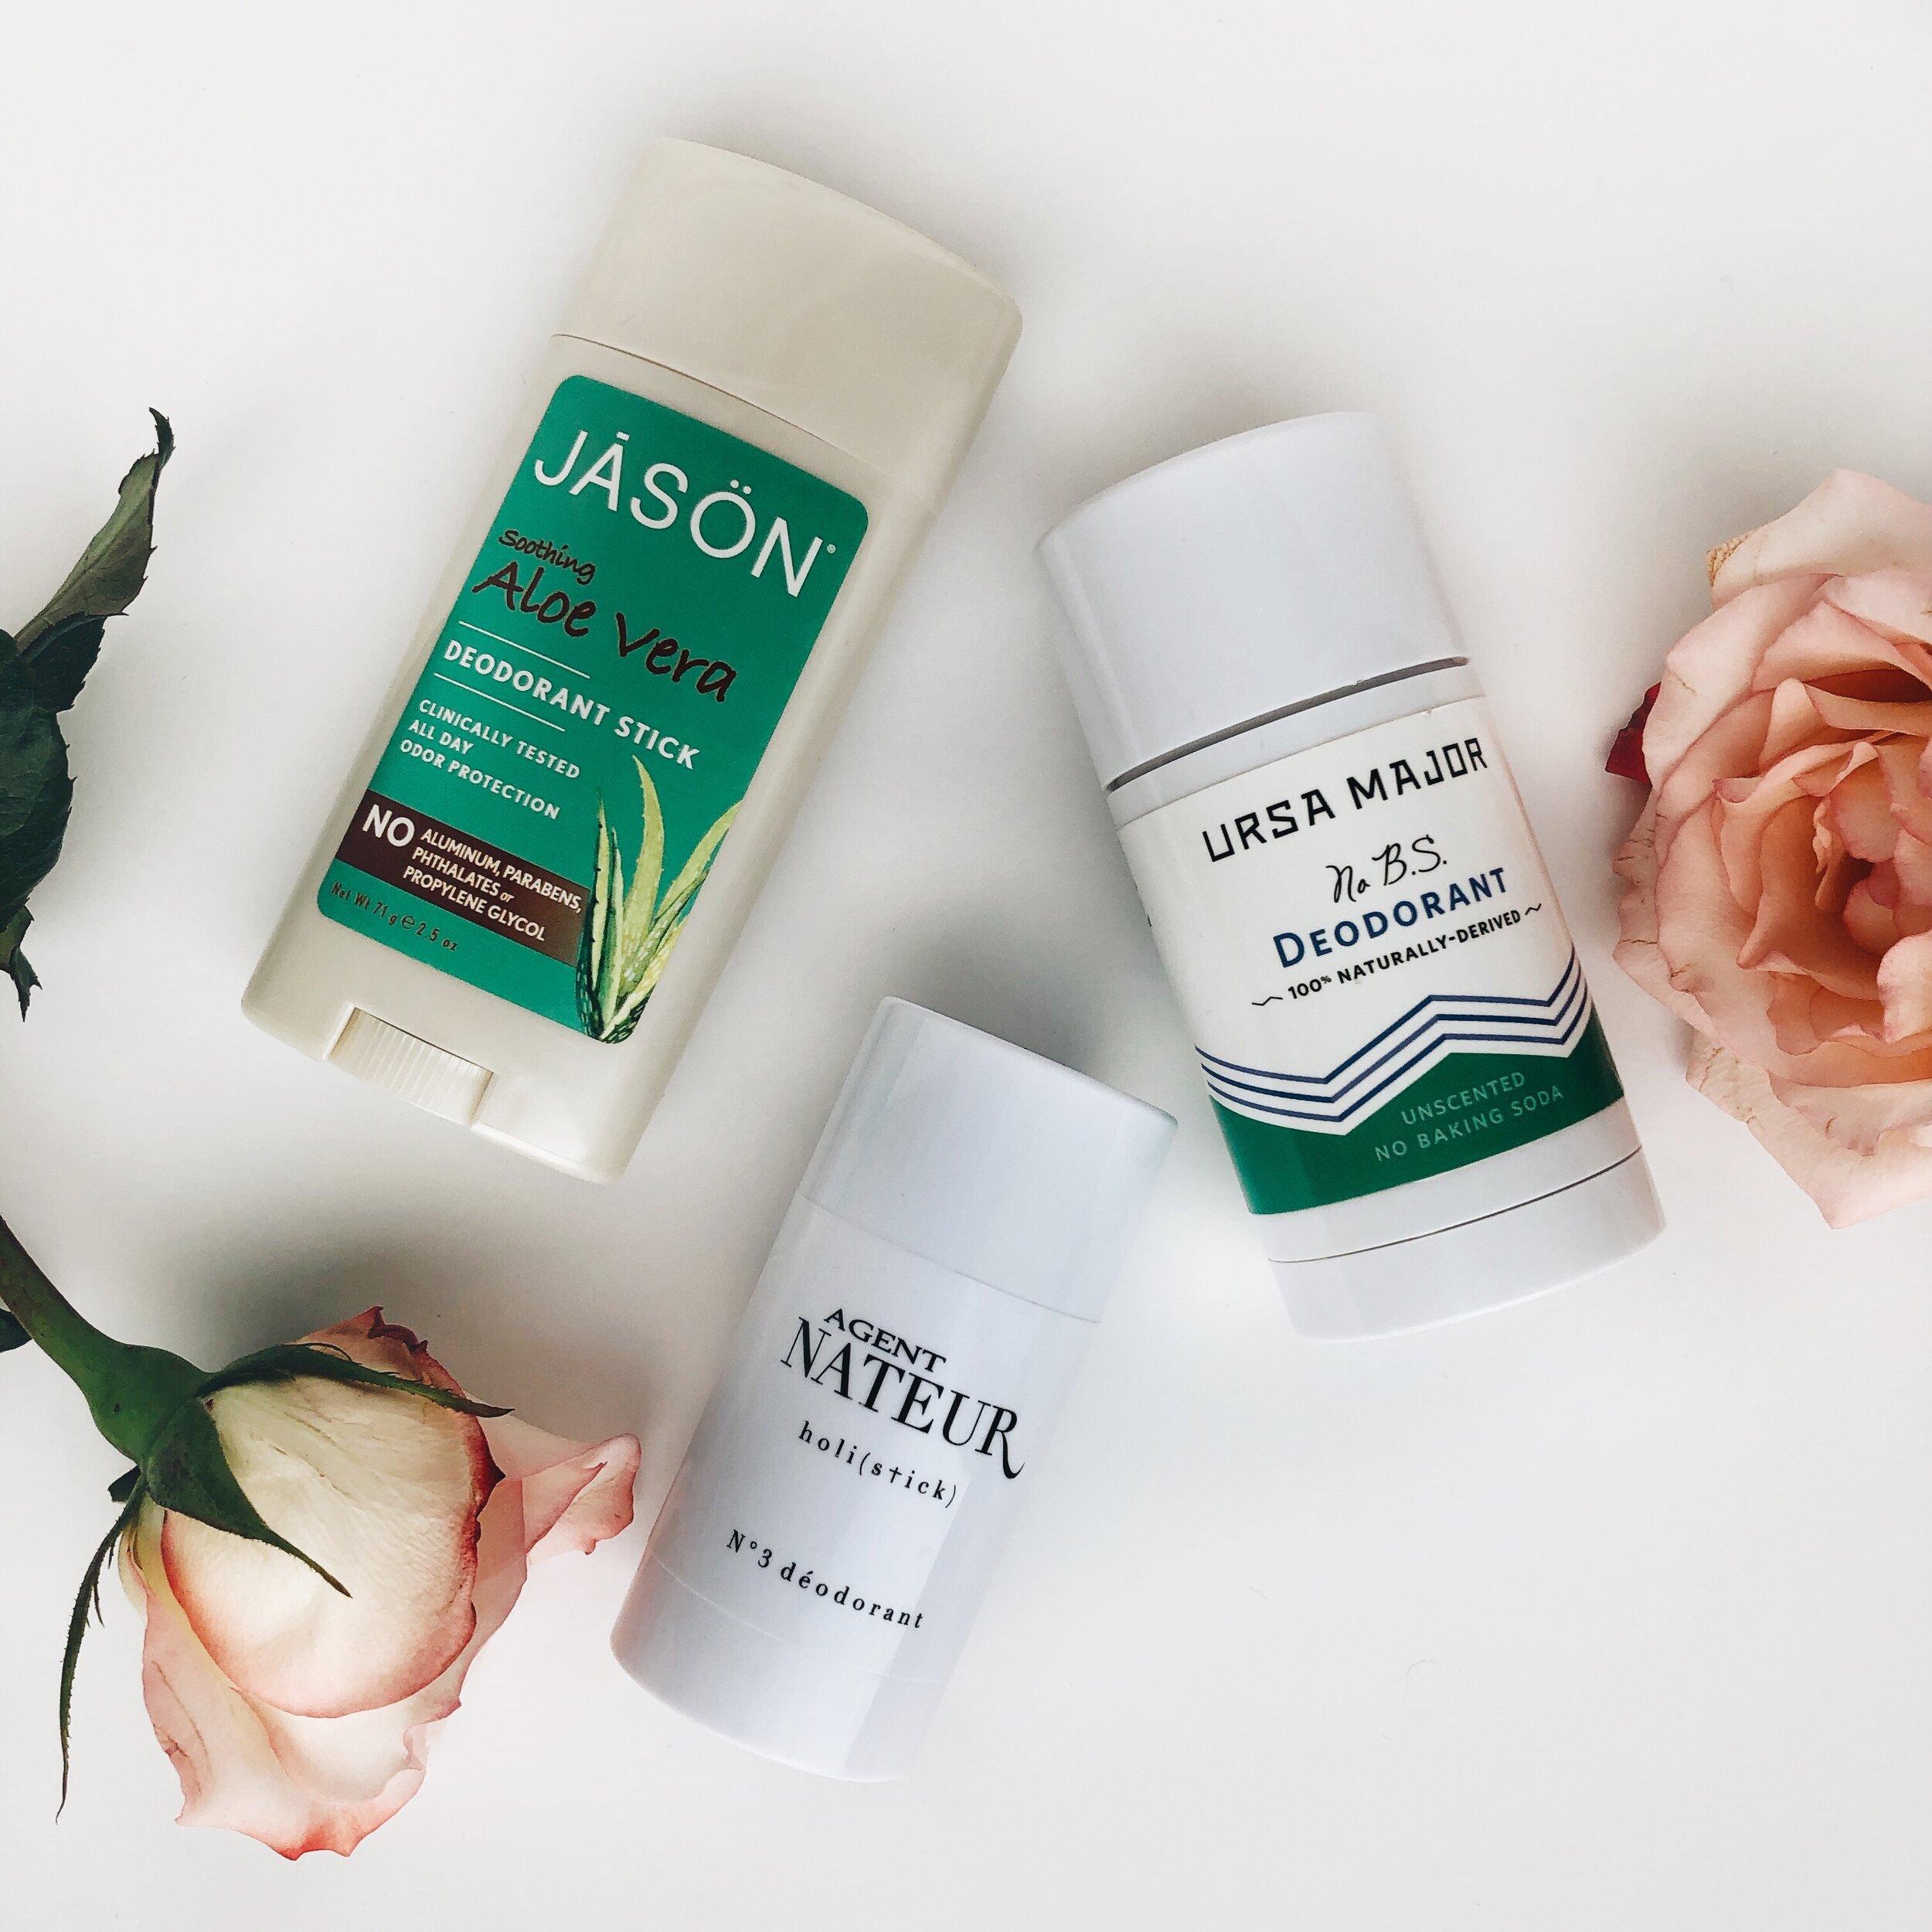 pregnancy-safe natural deodorants